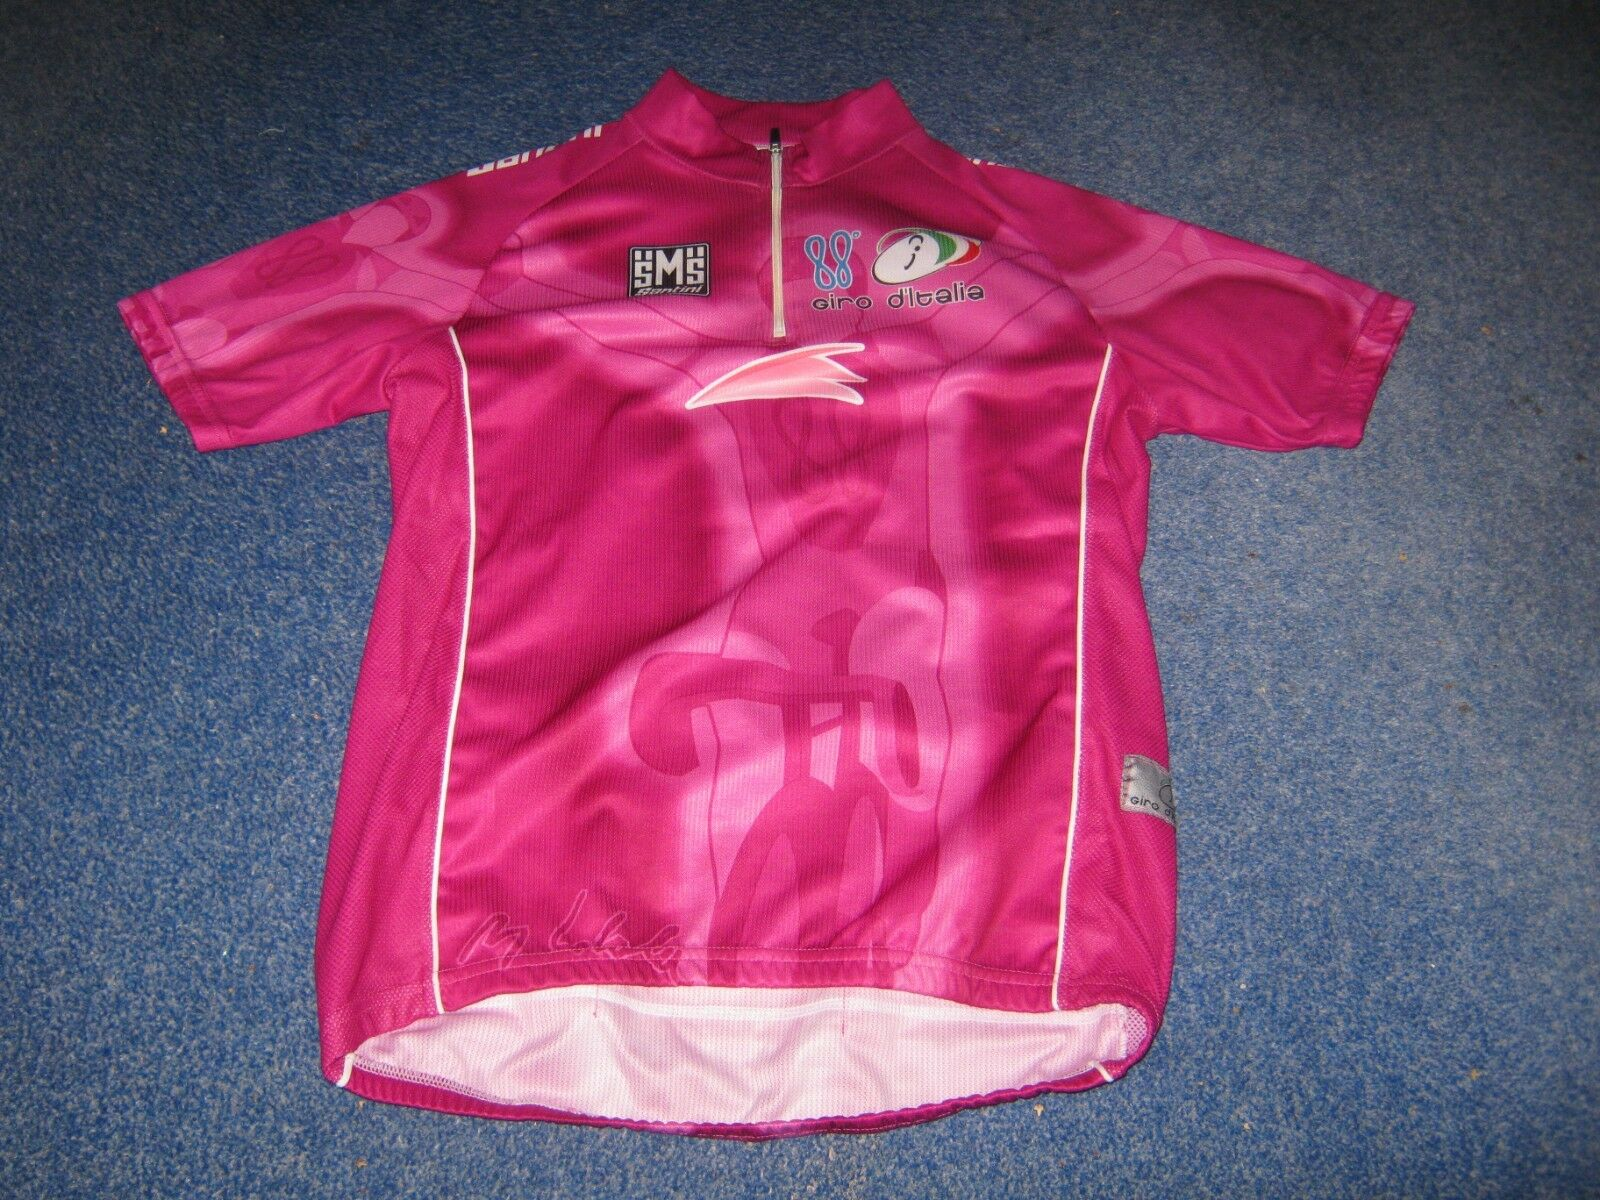 GIRO D'ITALIA TOUR TOUR TOUR OF ITALY 2005 SANTINI CICLAMINO CYCLING JERSEY 0b6b5f